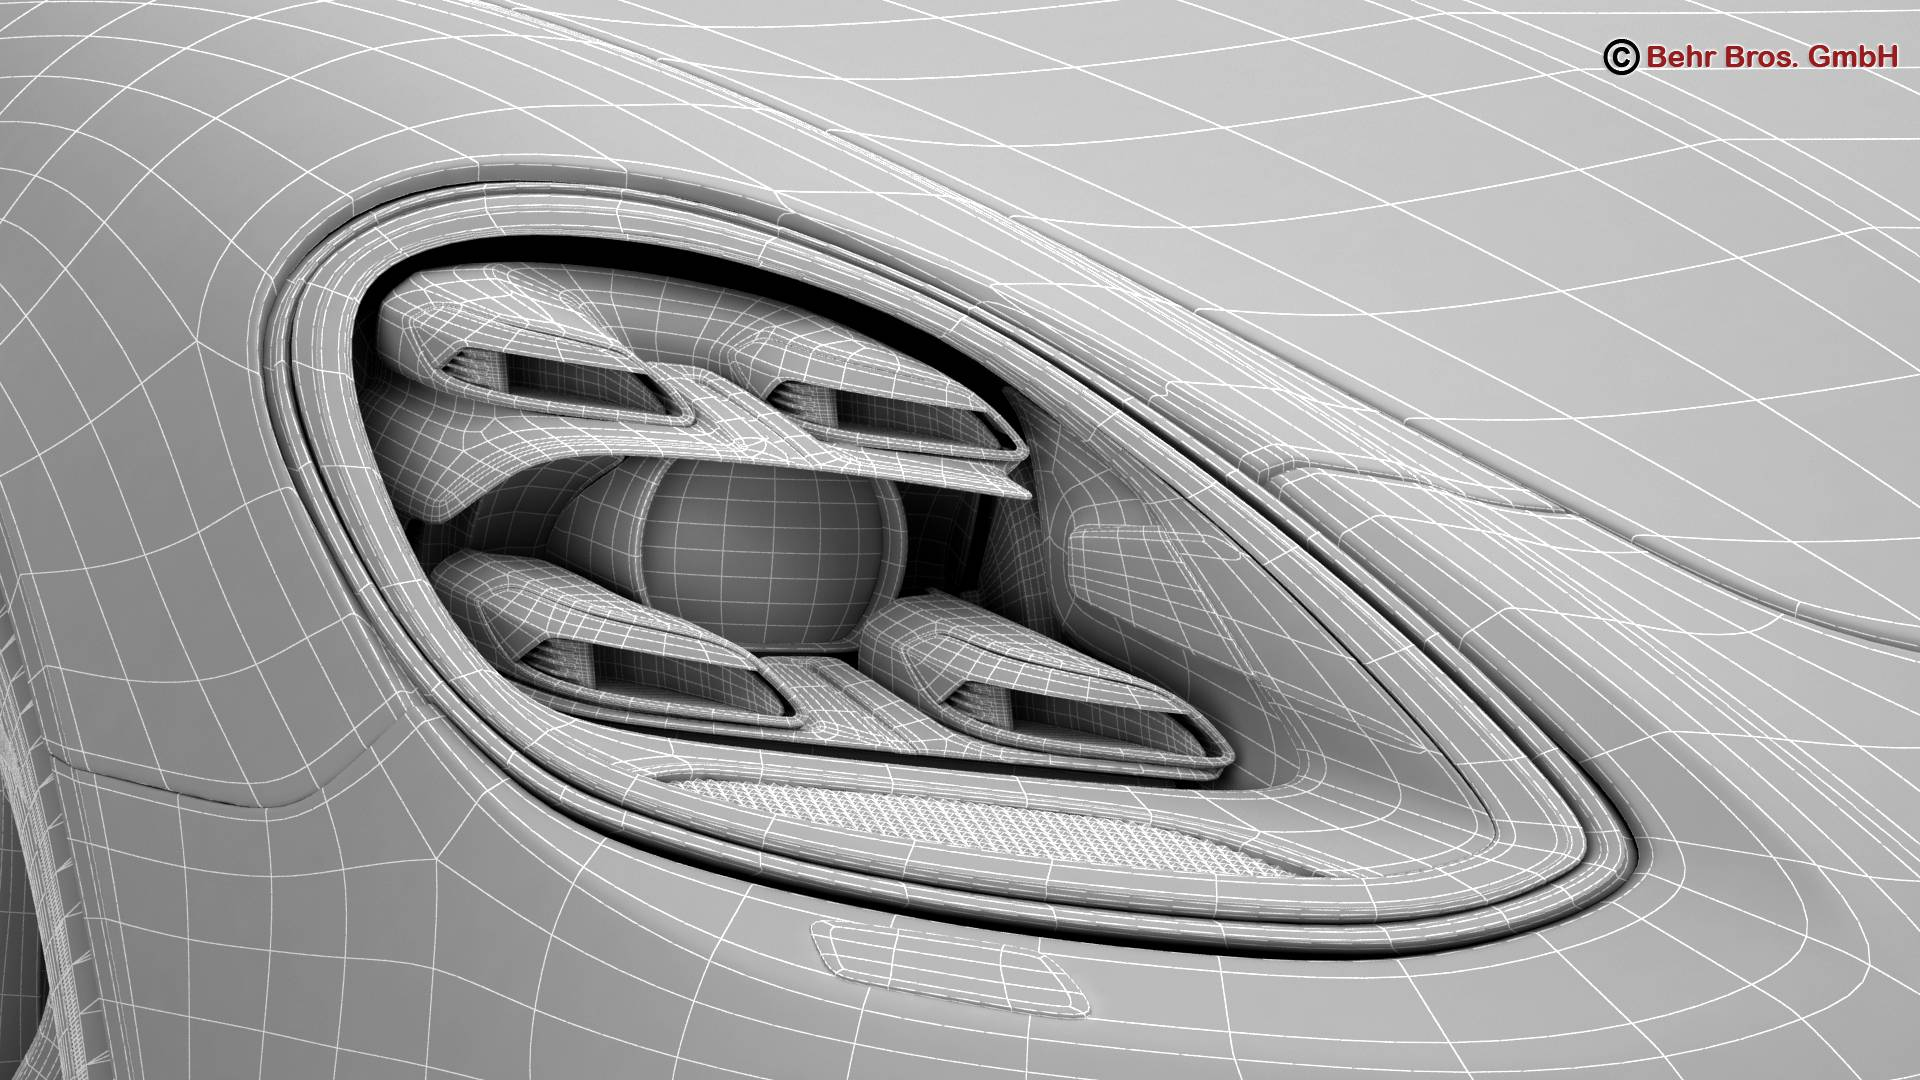 porsche panamera sport turismo turbo 2018 3d model 3ds max fbx c4d lwo ma mb obj 252522